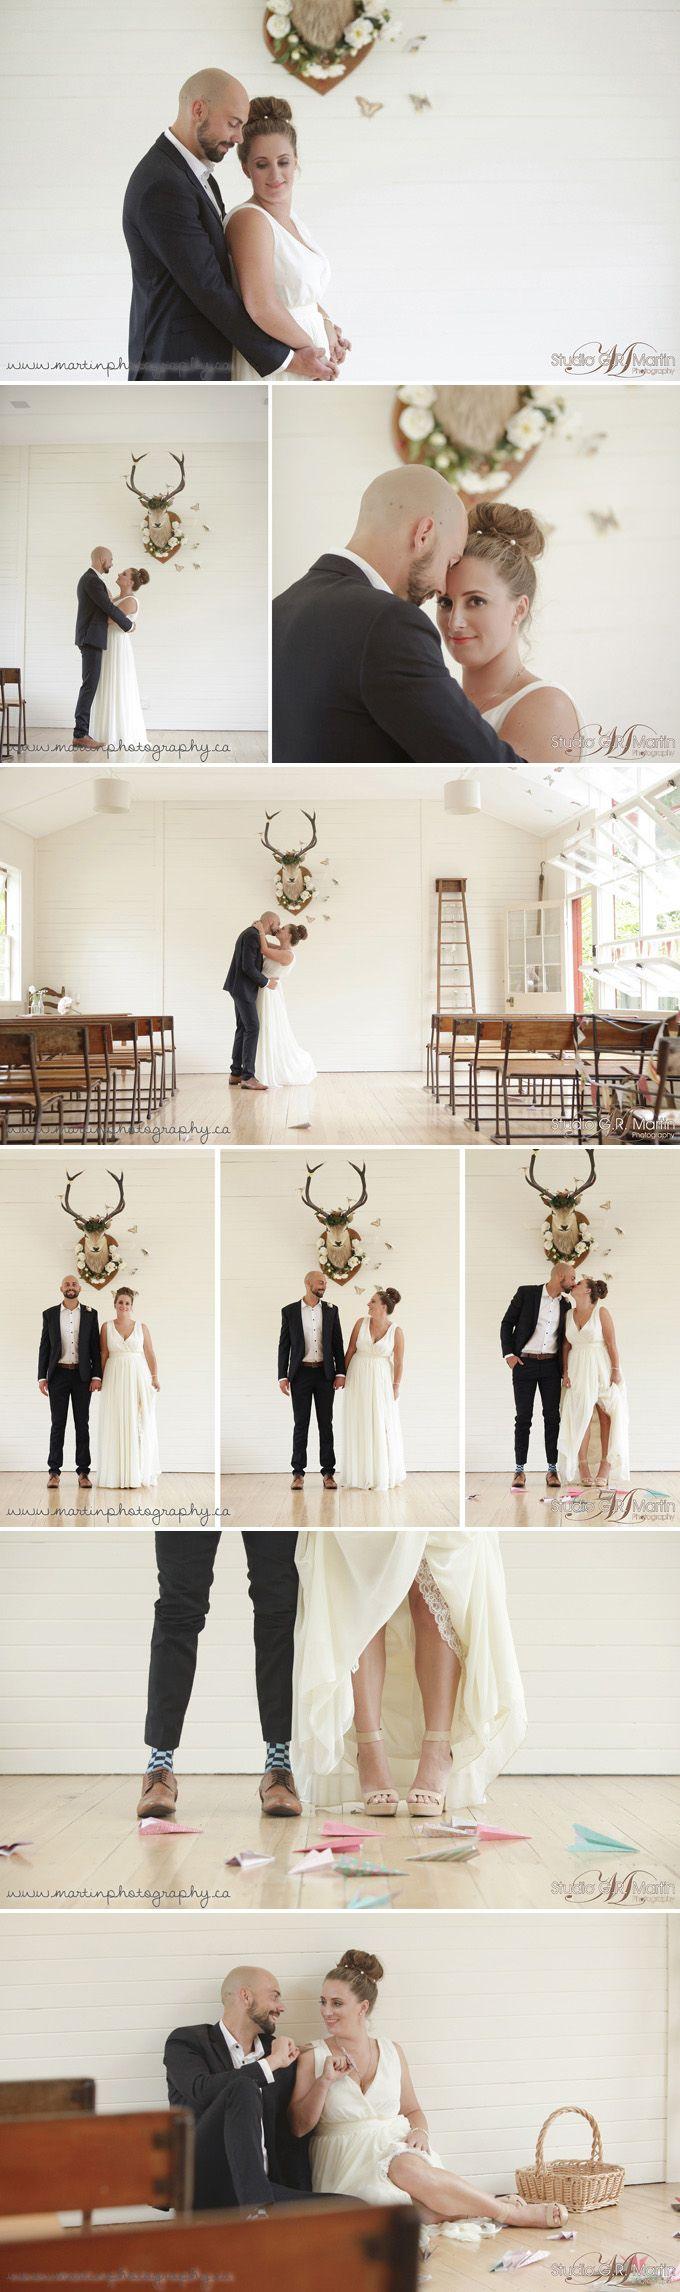 New Zealand destination Old forest school Rotorua Ottawa wedding and portrait photographer